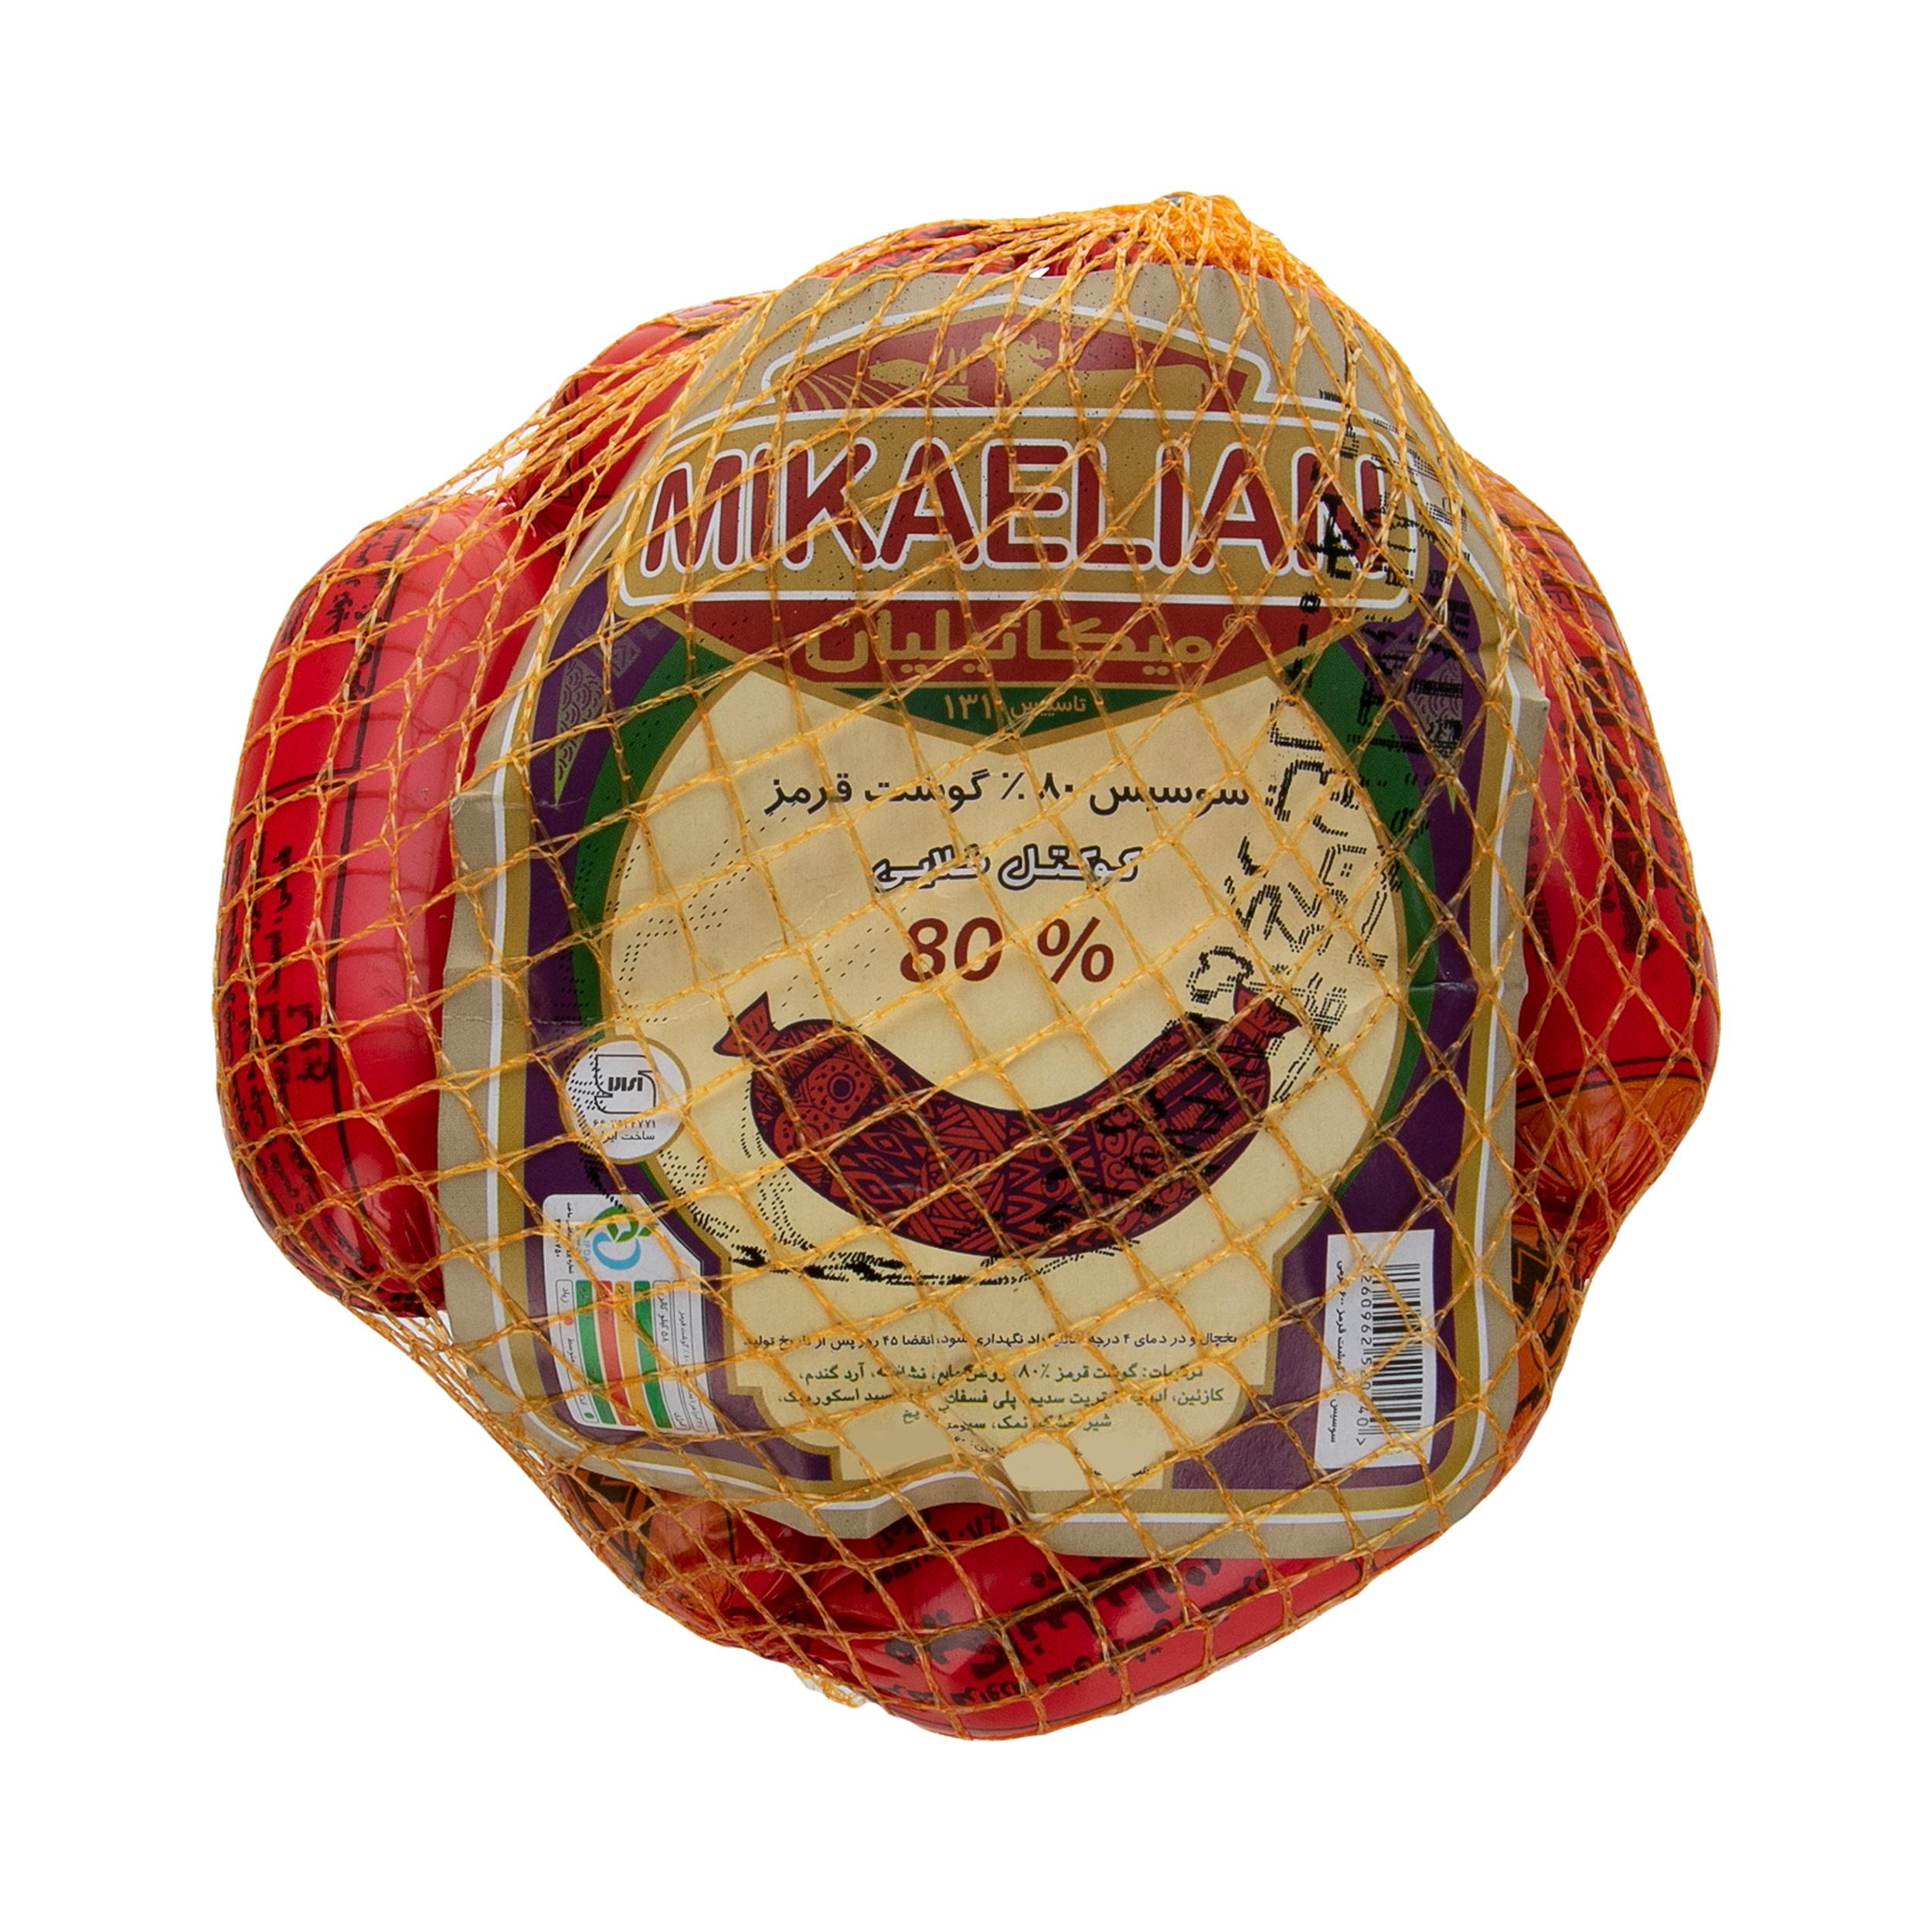 کوکتل طلایی گوشت قرمز 80% میکائیلیان مقدار 600 گرم